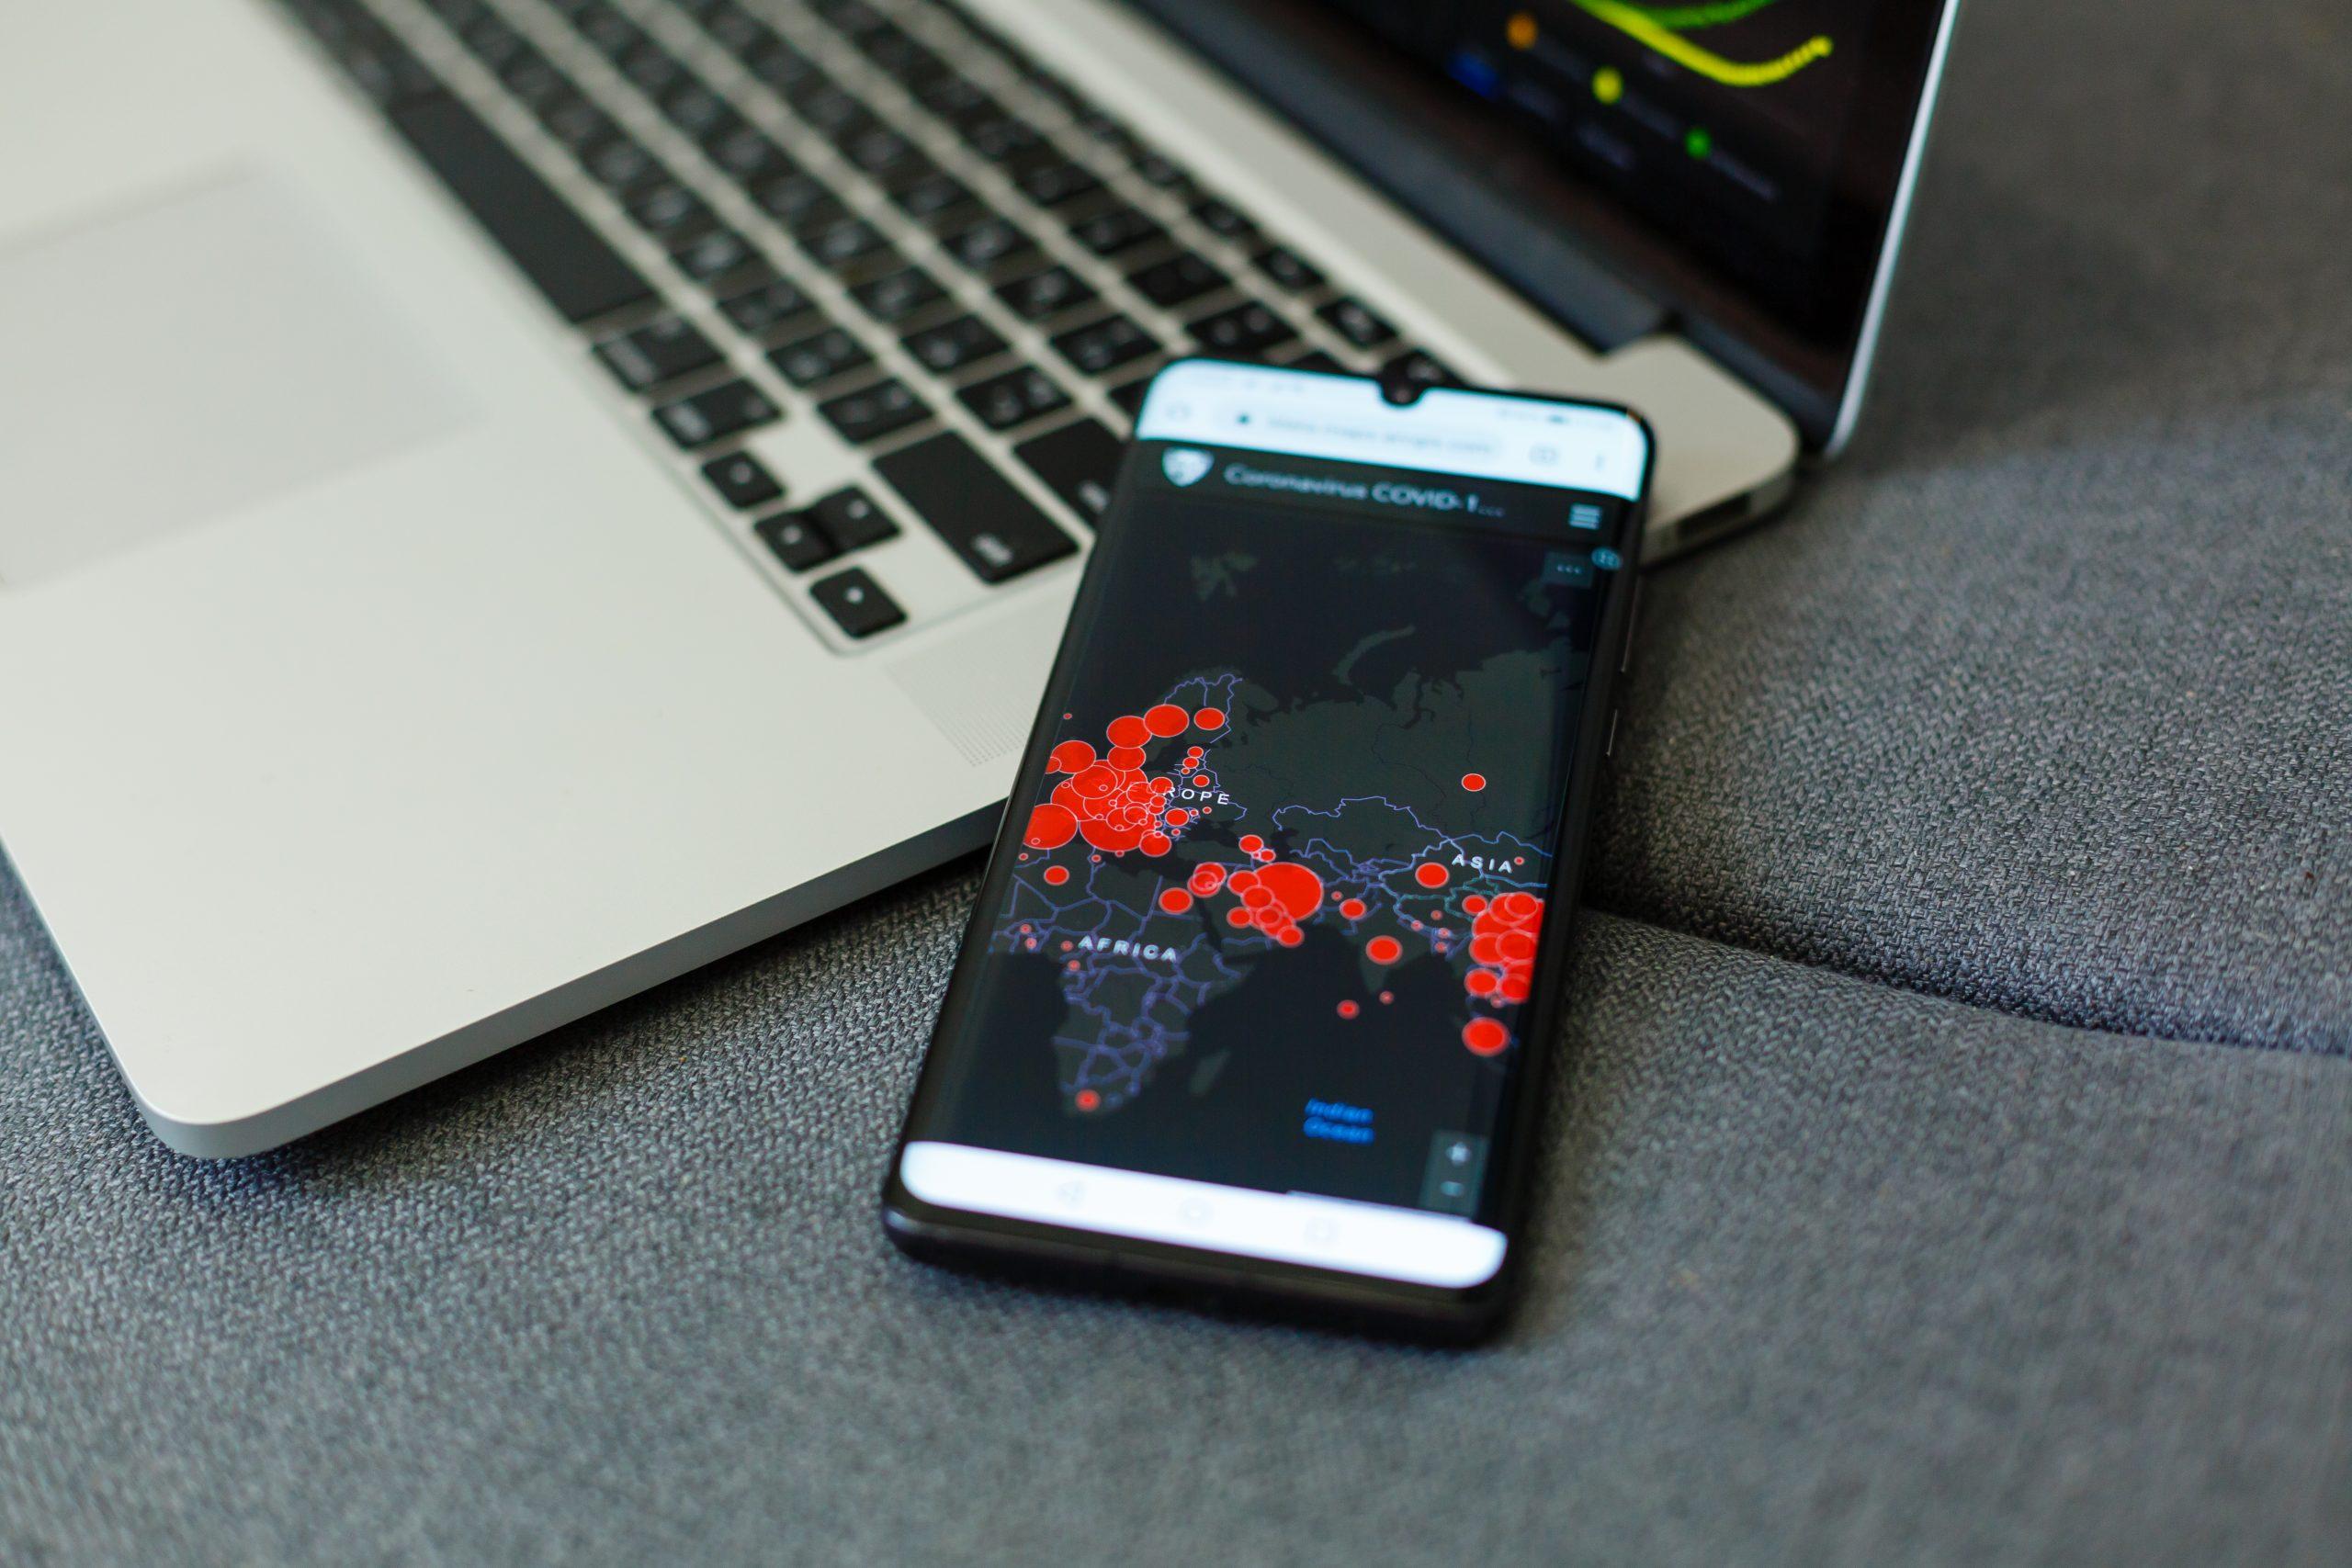 coronavirus tracking application on mobile phone